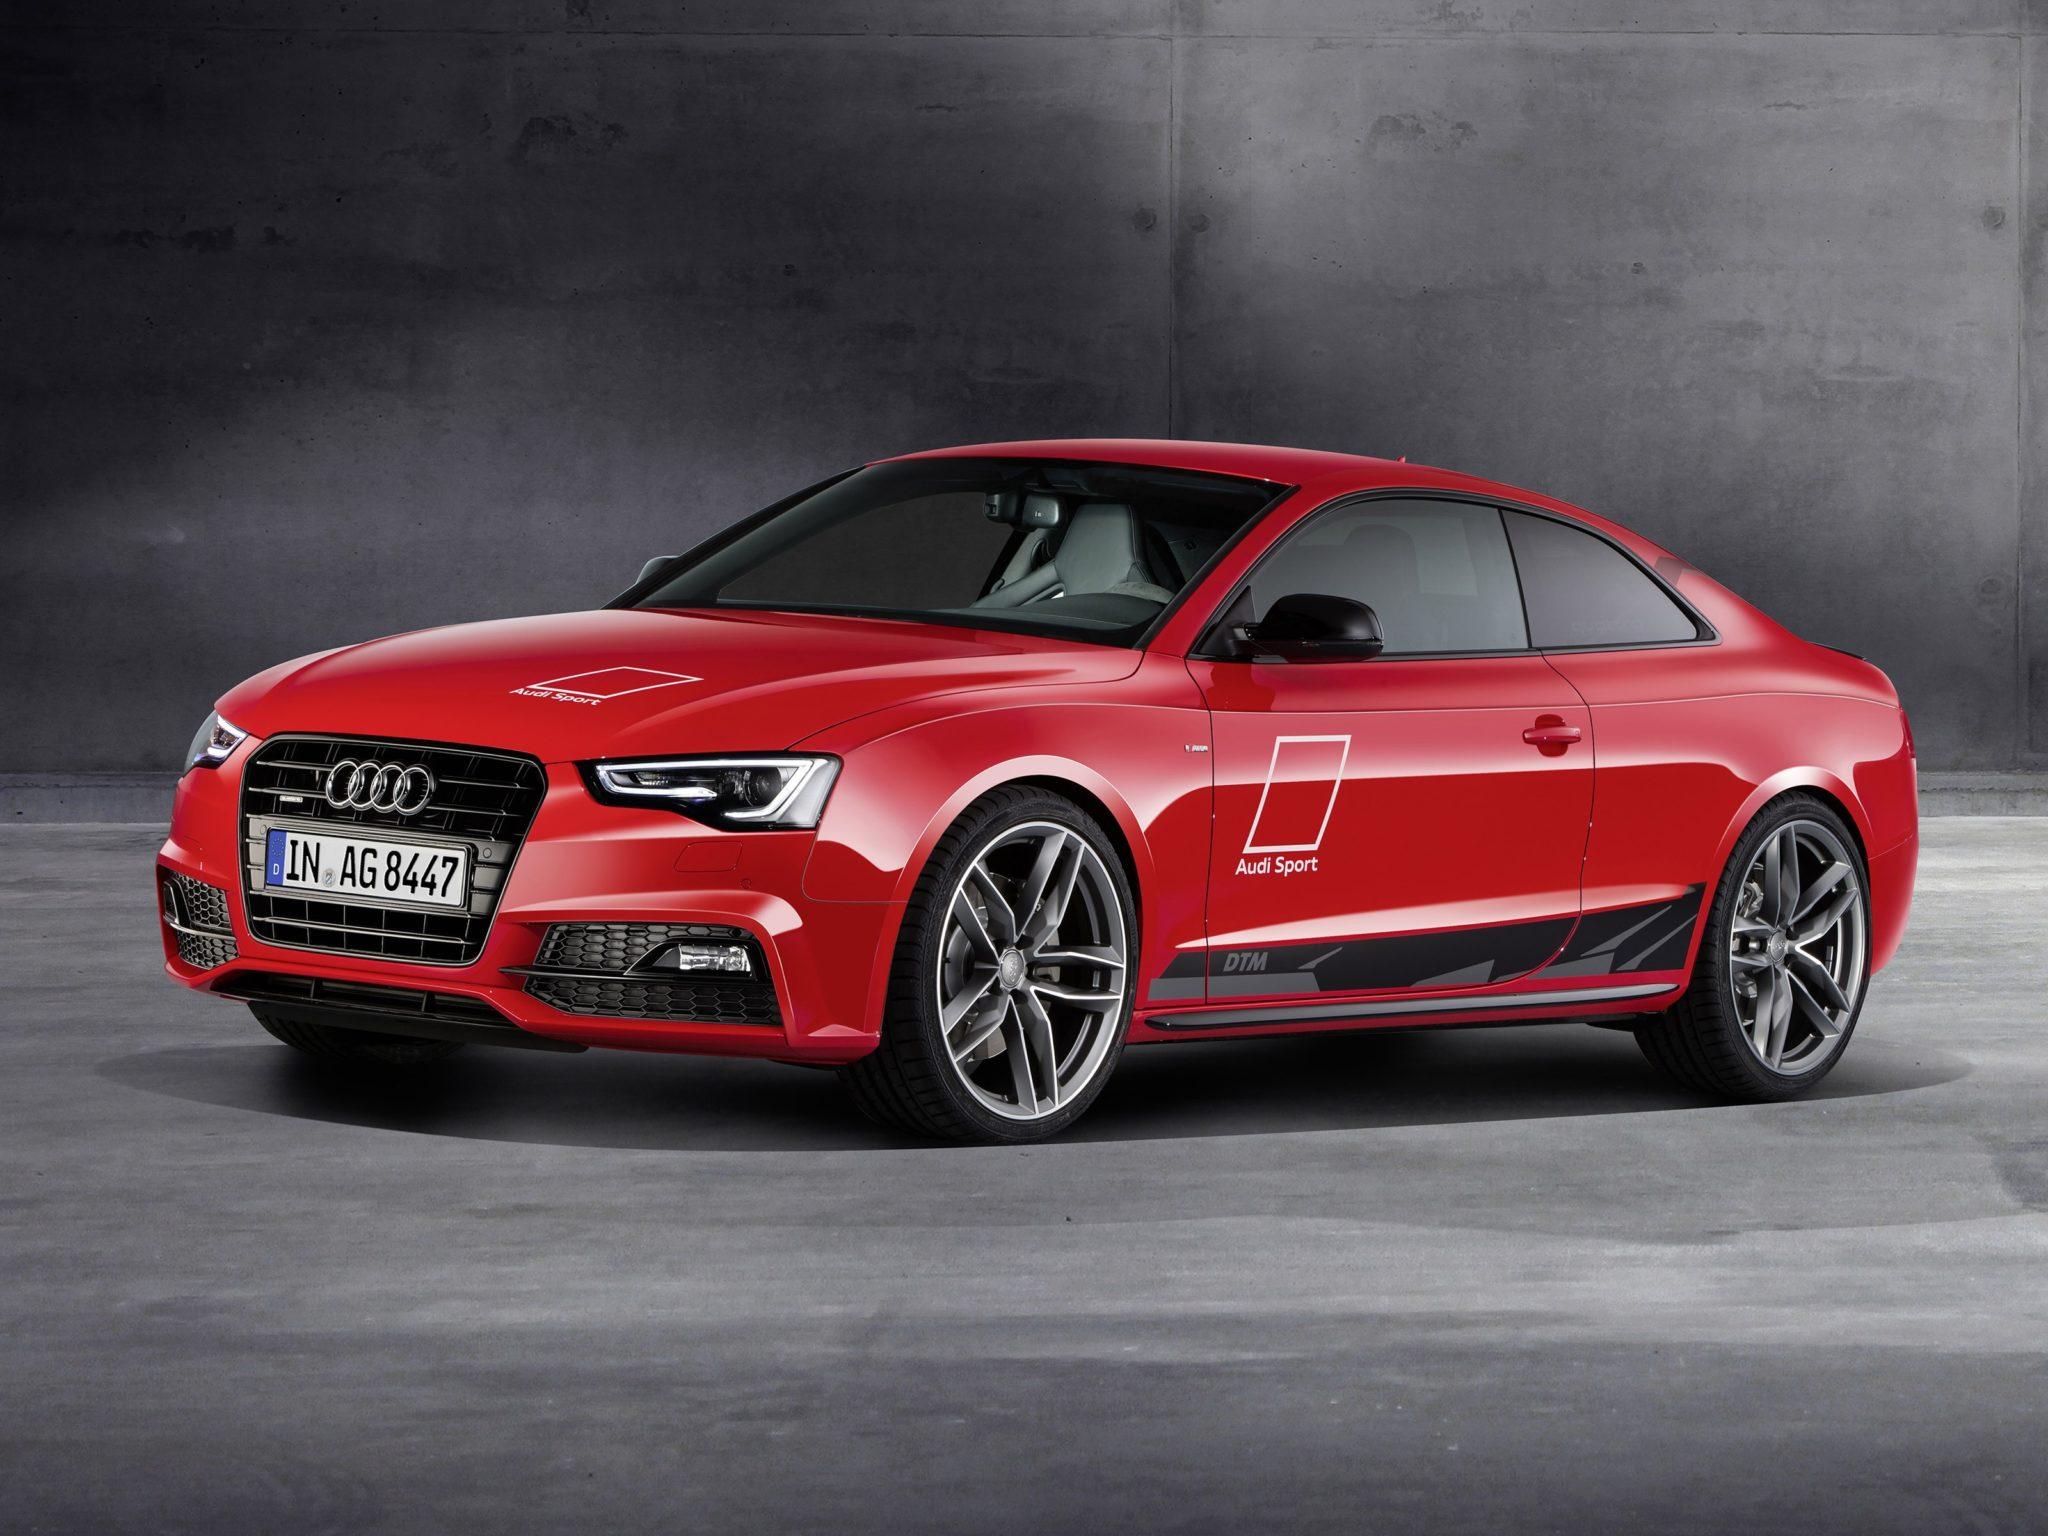 2015 Audi A5 Coupe DTM Selection